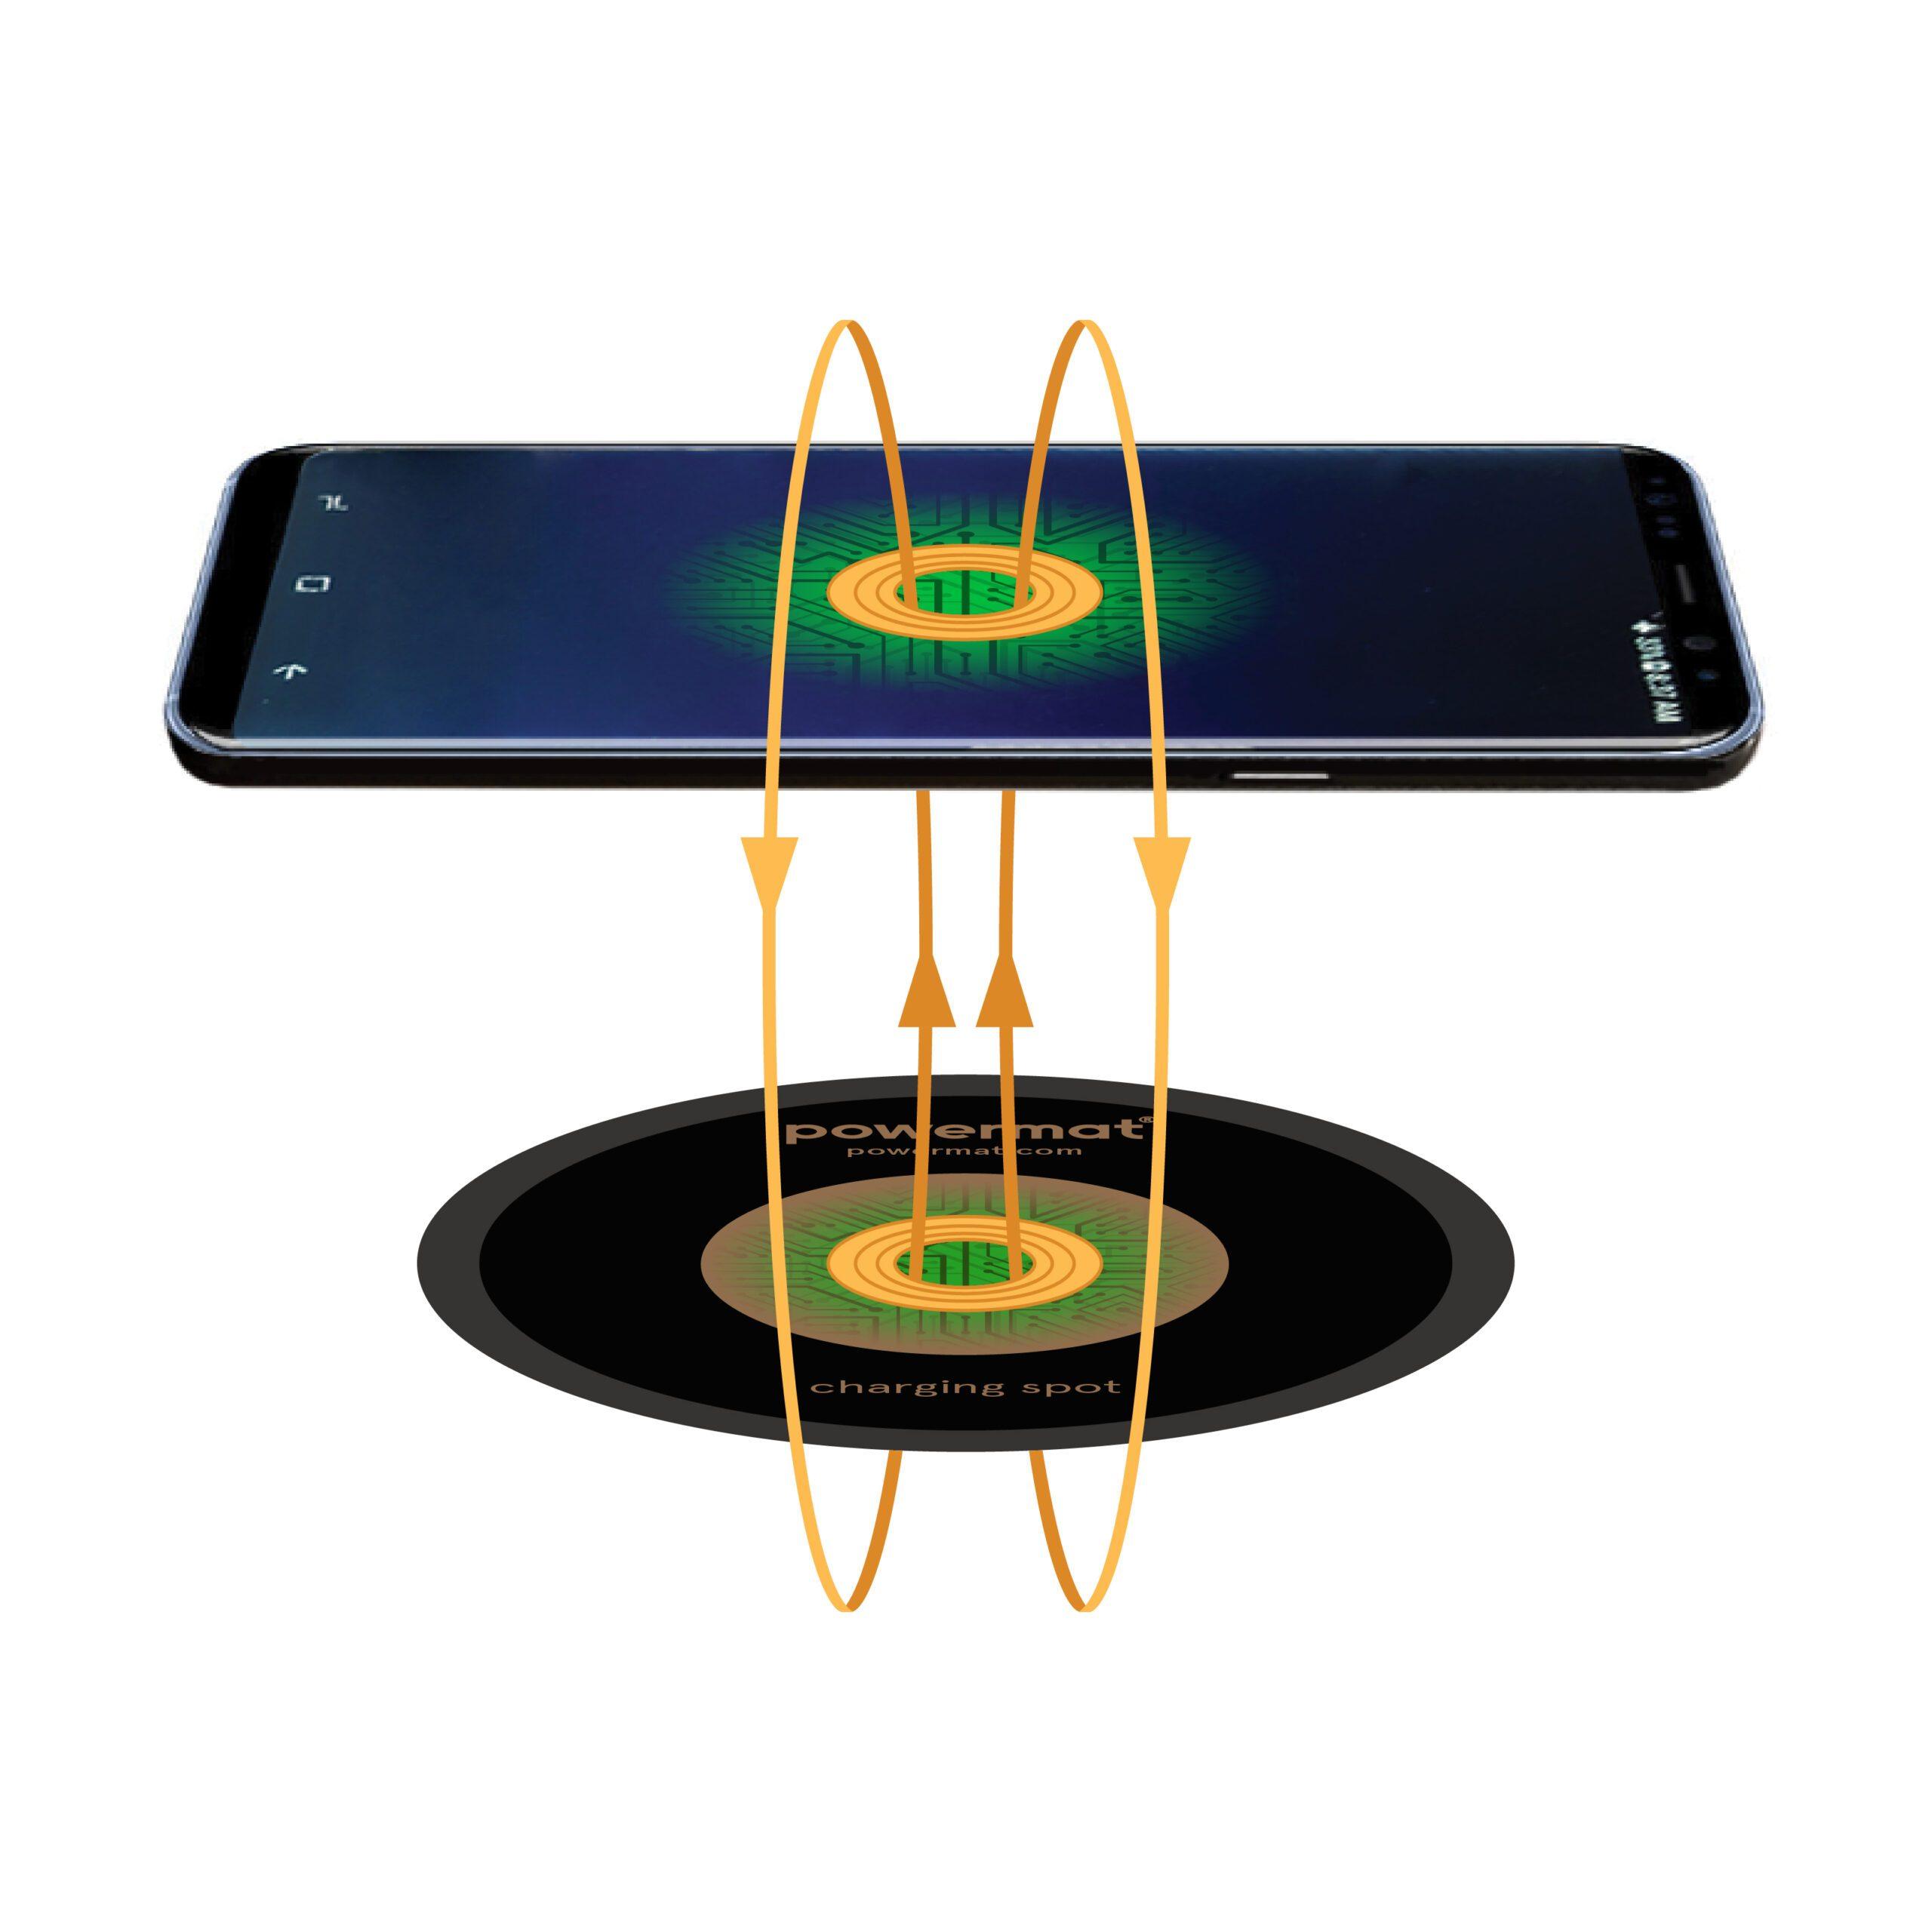 POWERMAT INNOVATION Advanced Wireless Power Technology